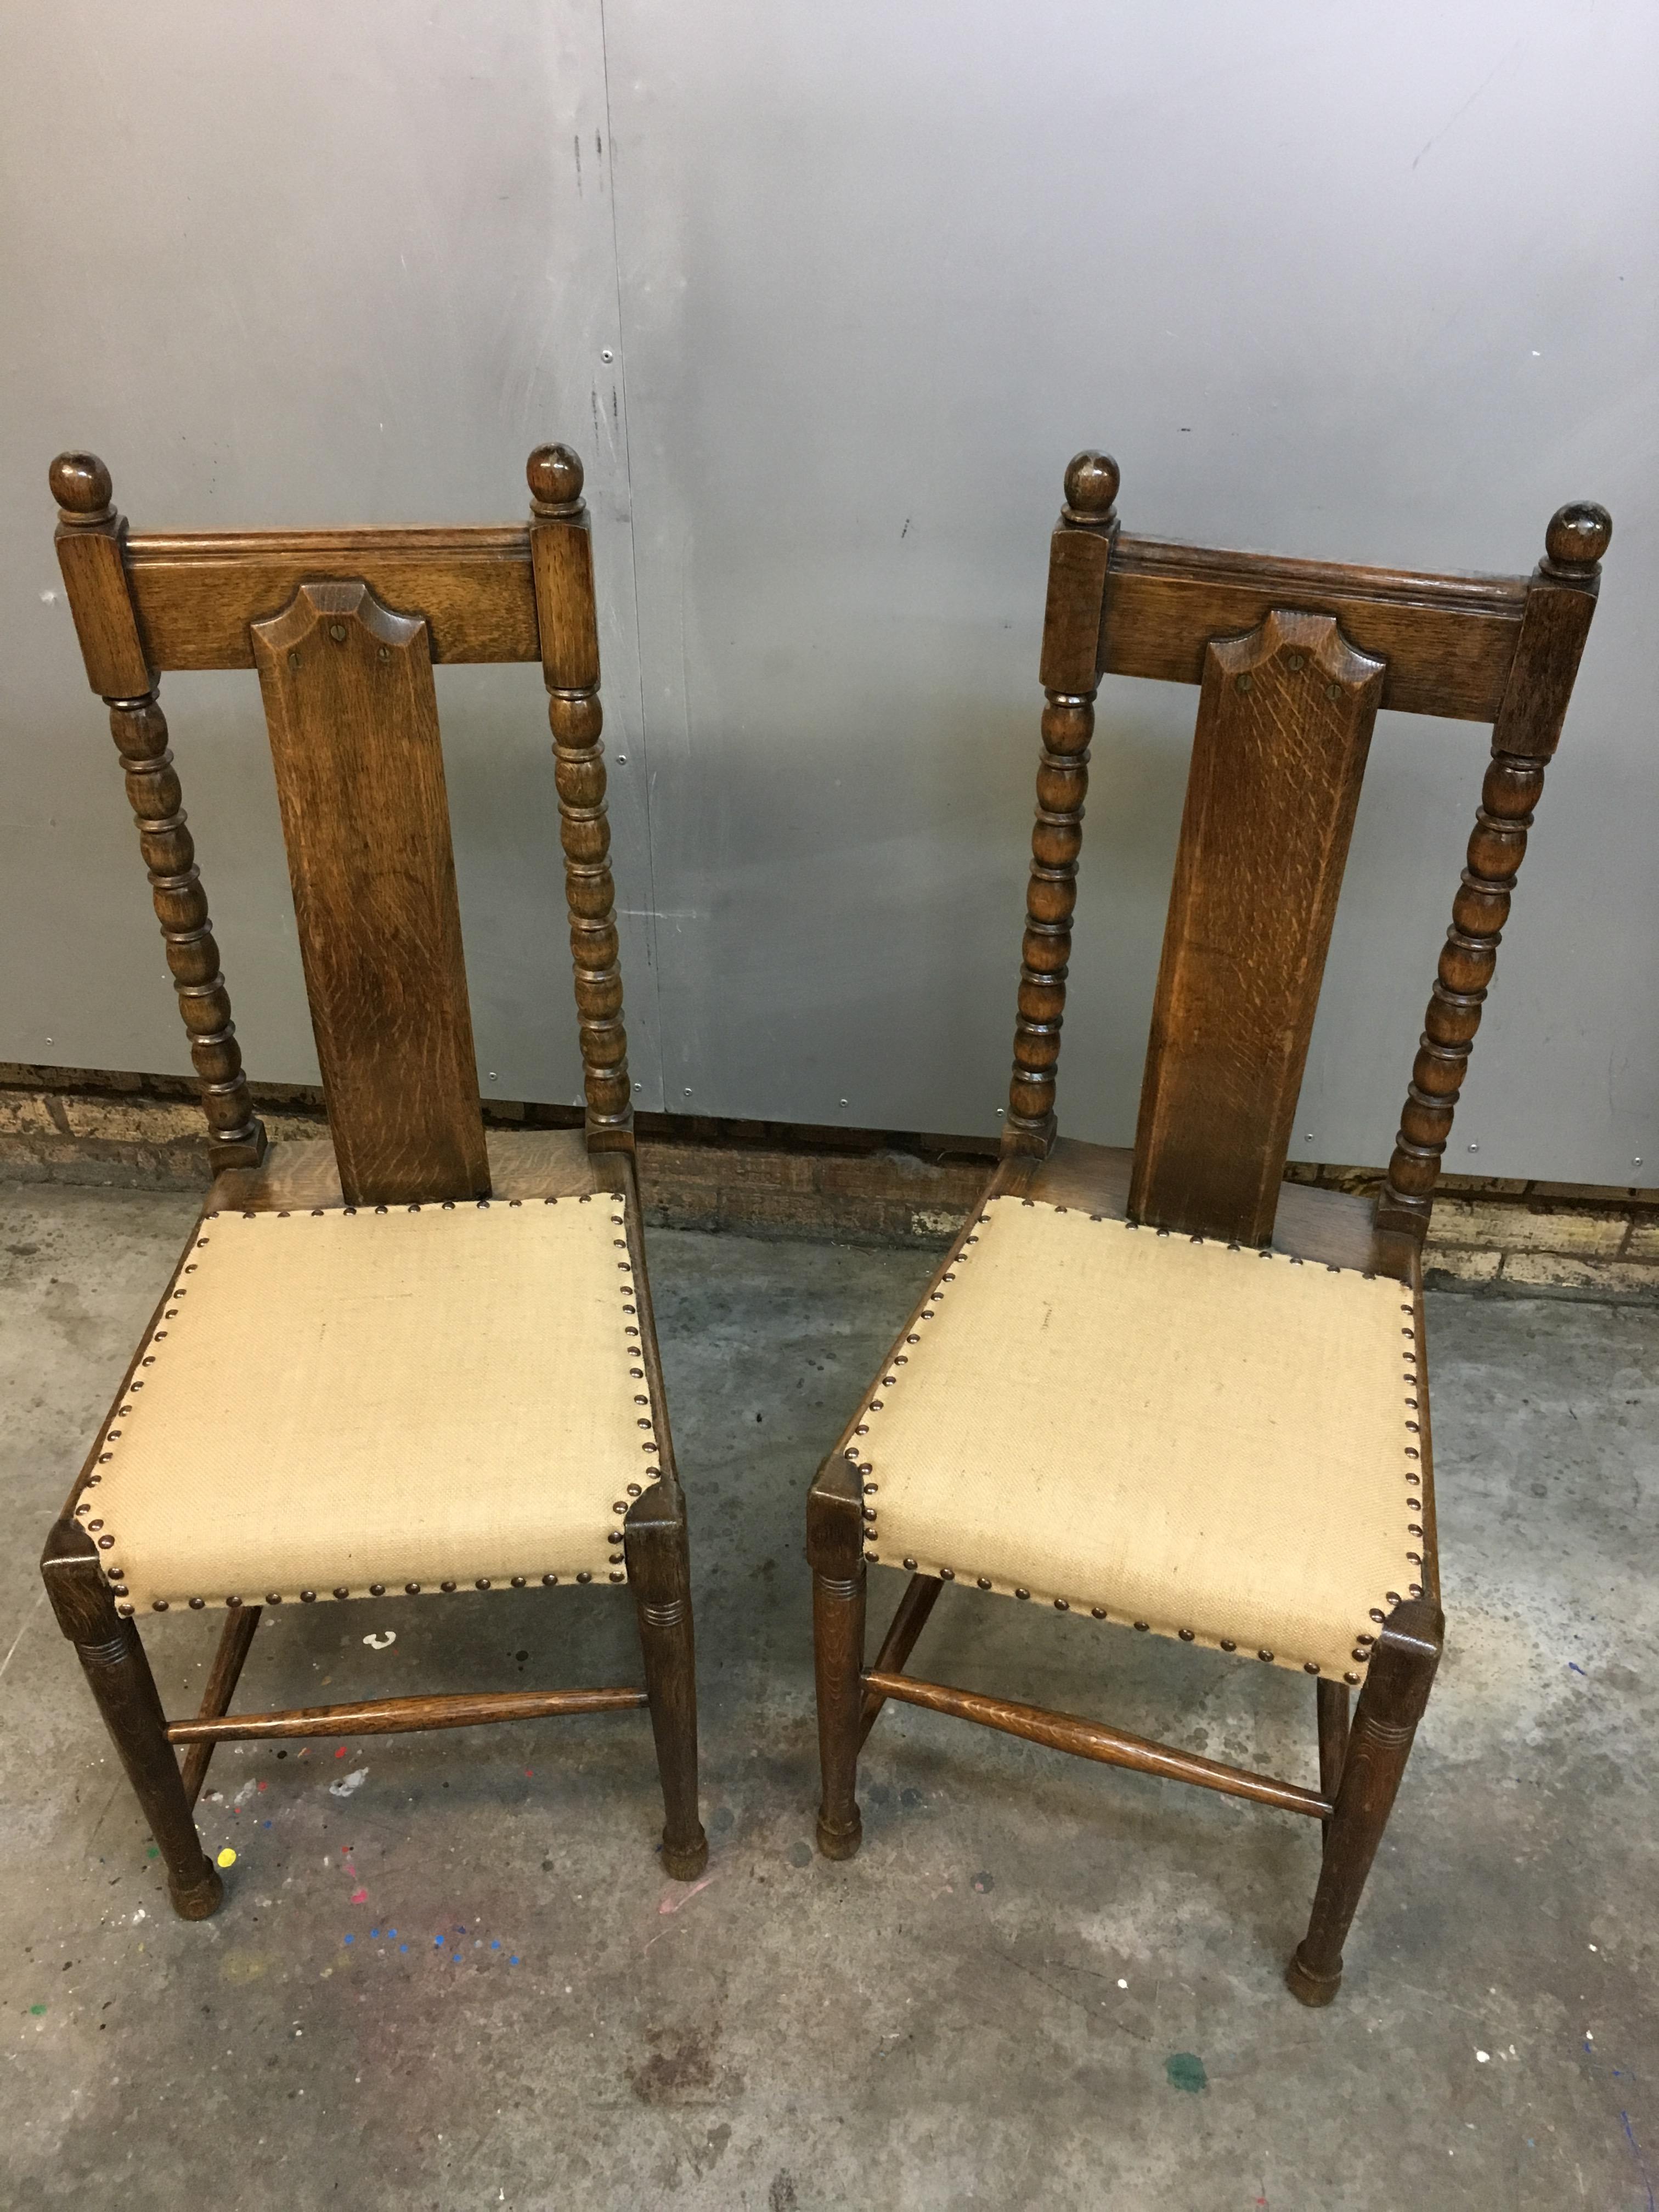 Antique Furniture Upholstery 28 Images Furniture Restoration Reupholstery Schindler S